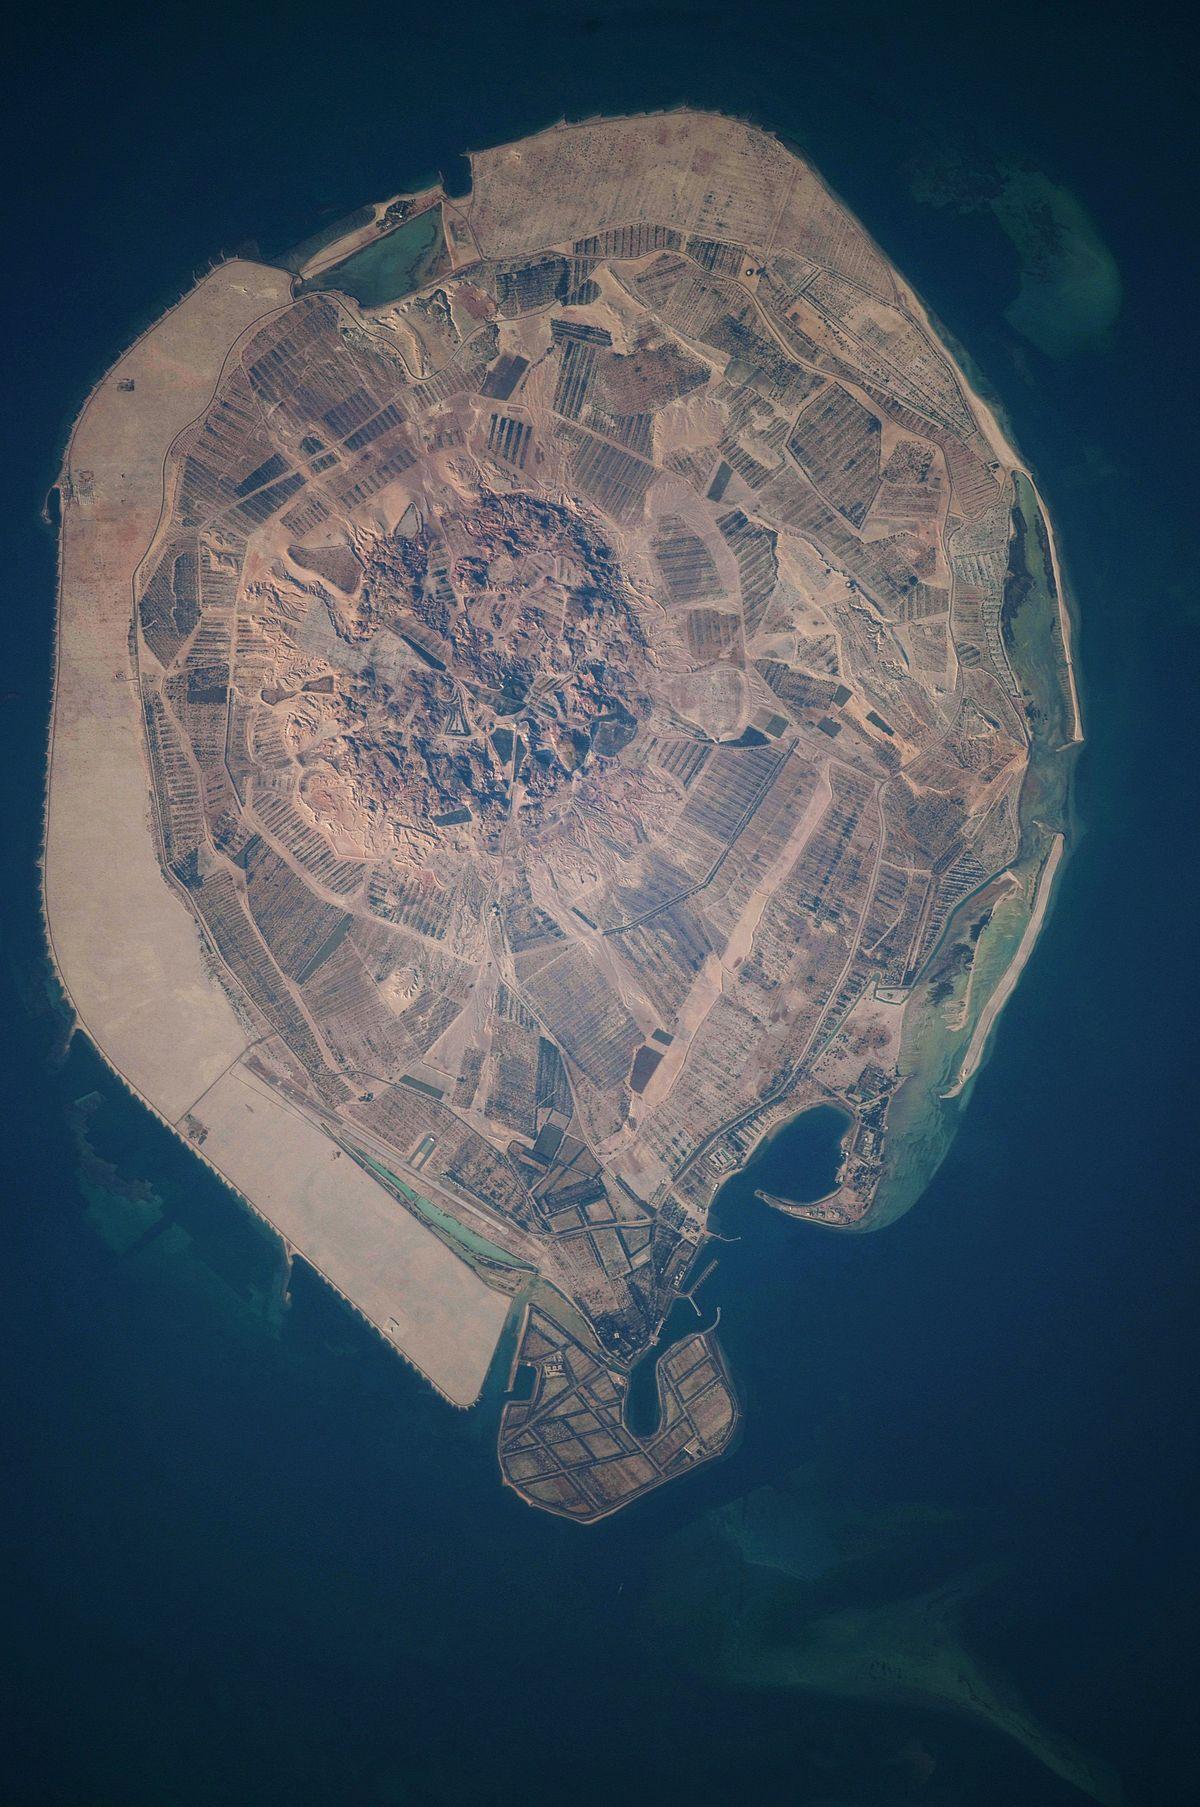 Sir Bani Yas Island – Travel guide at Wikivoyage